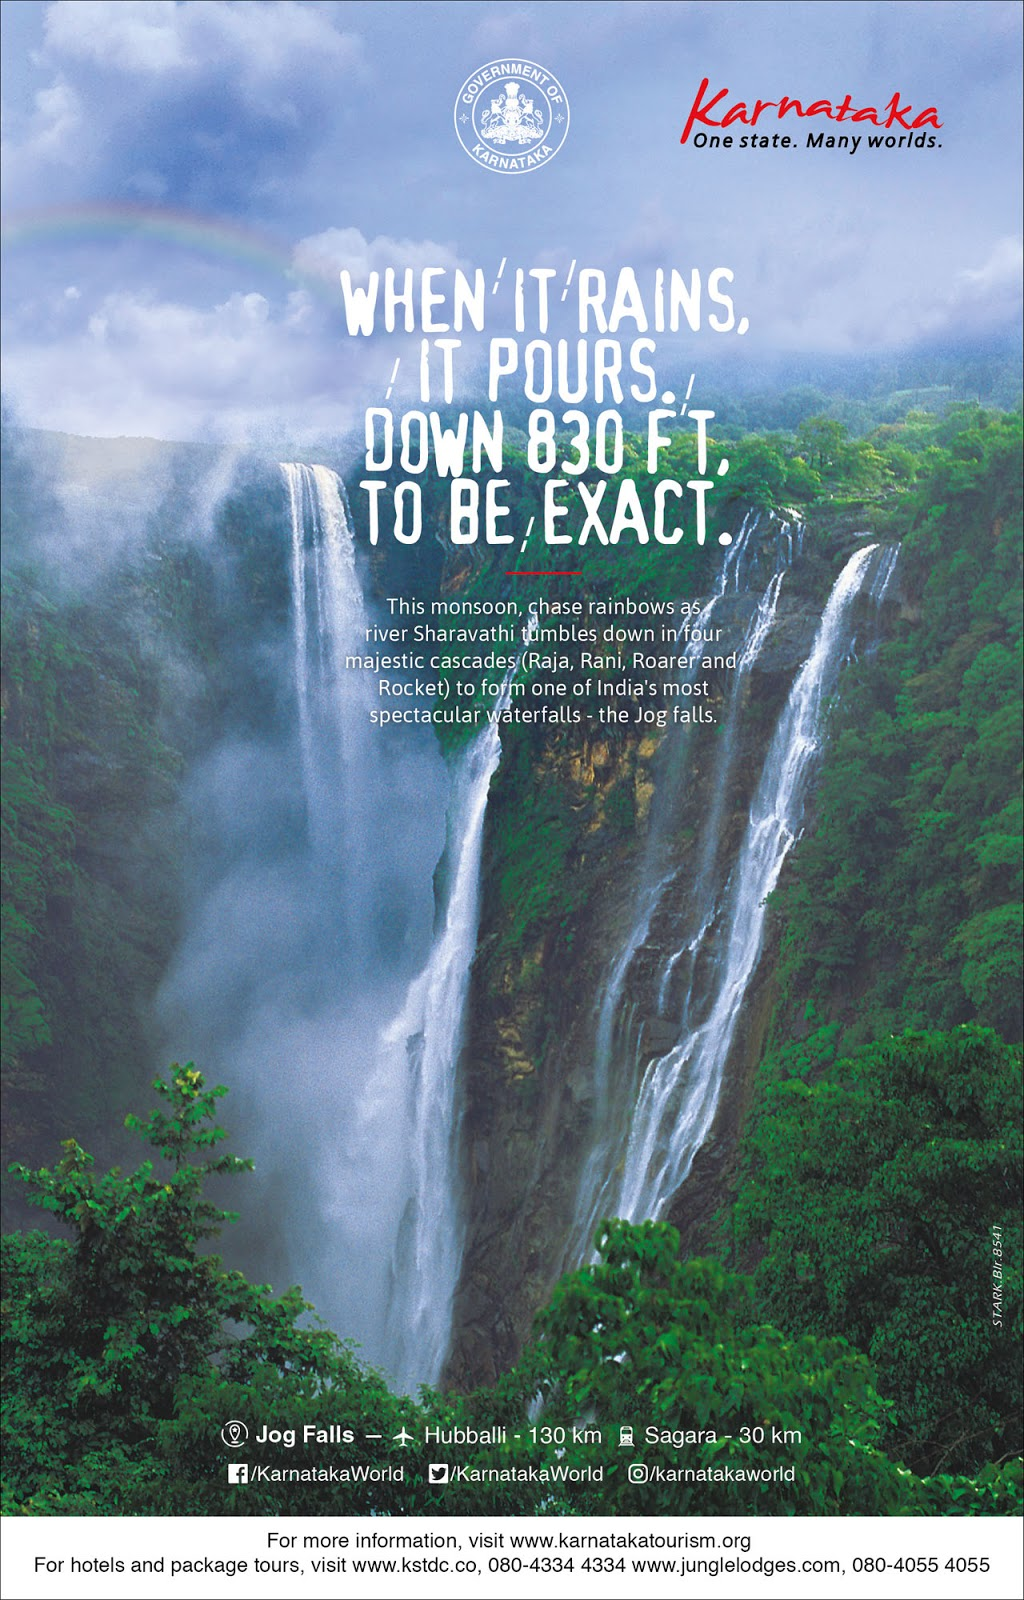 Monsoon at Jogfalls by Department of Tourism, Karnataka | Stark Communications Pvt Ltd